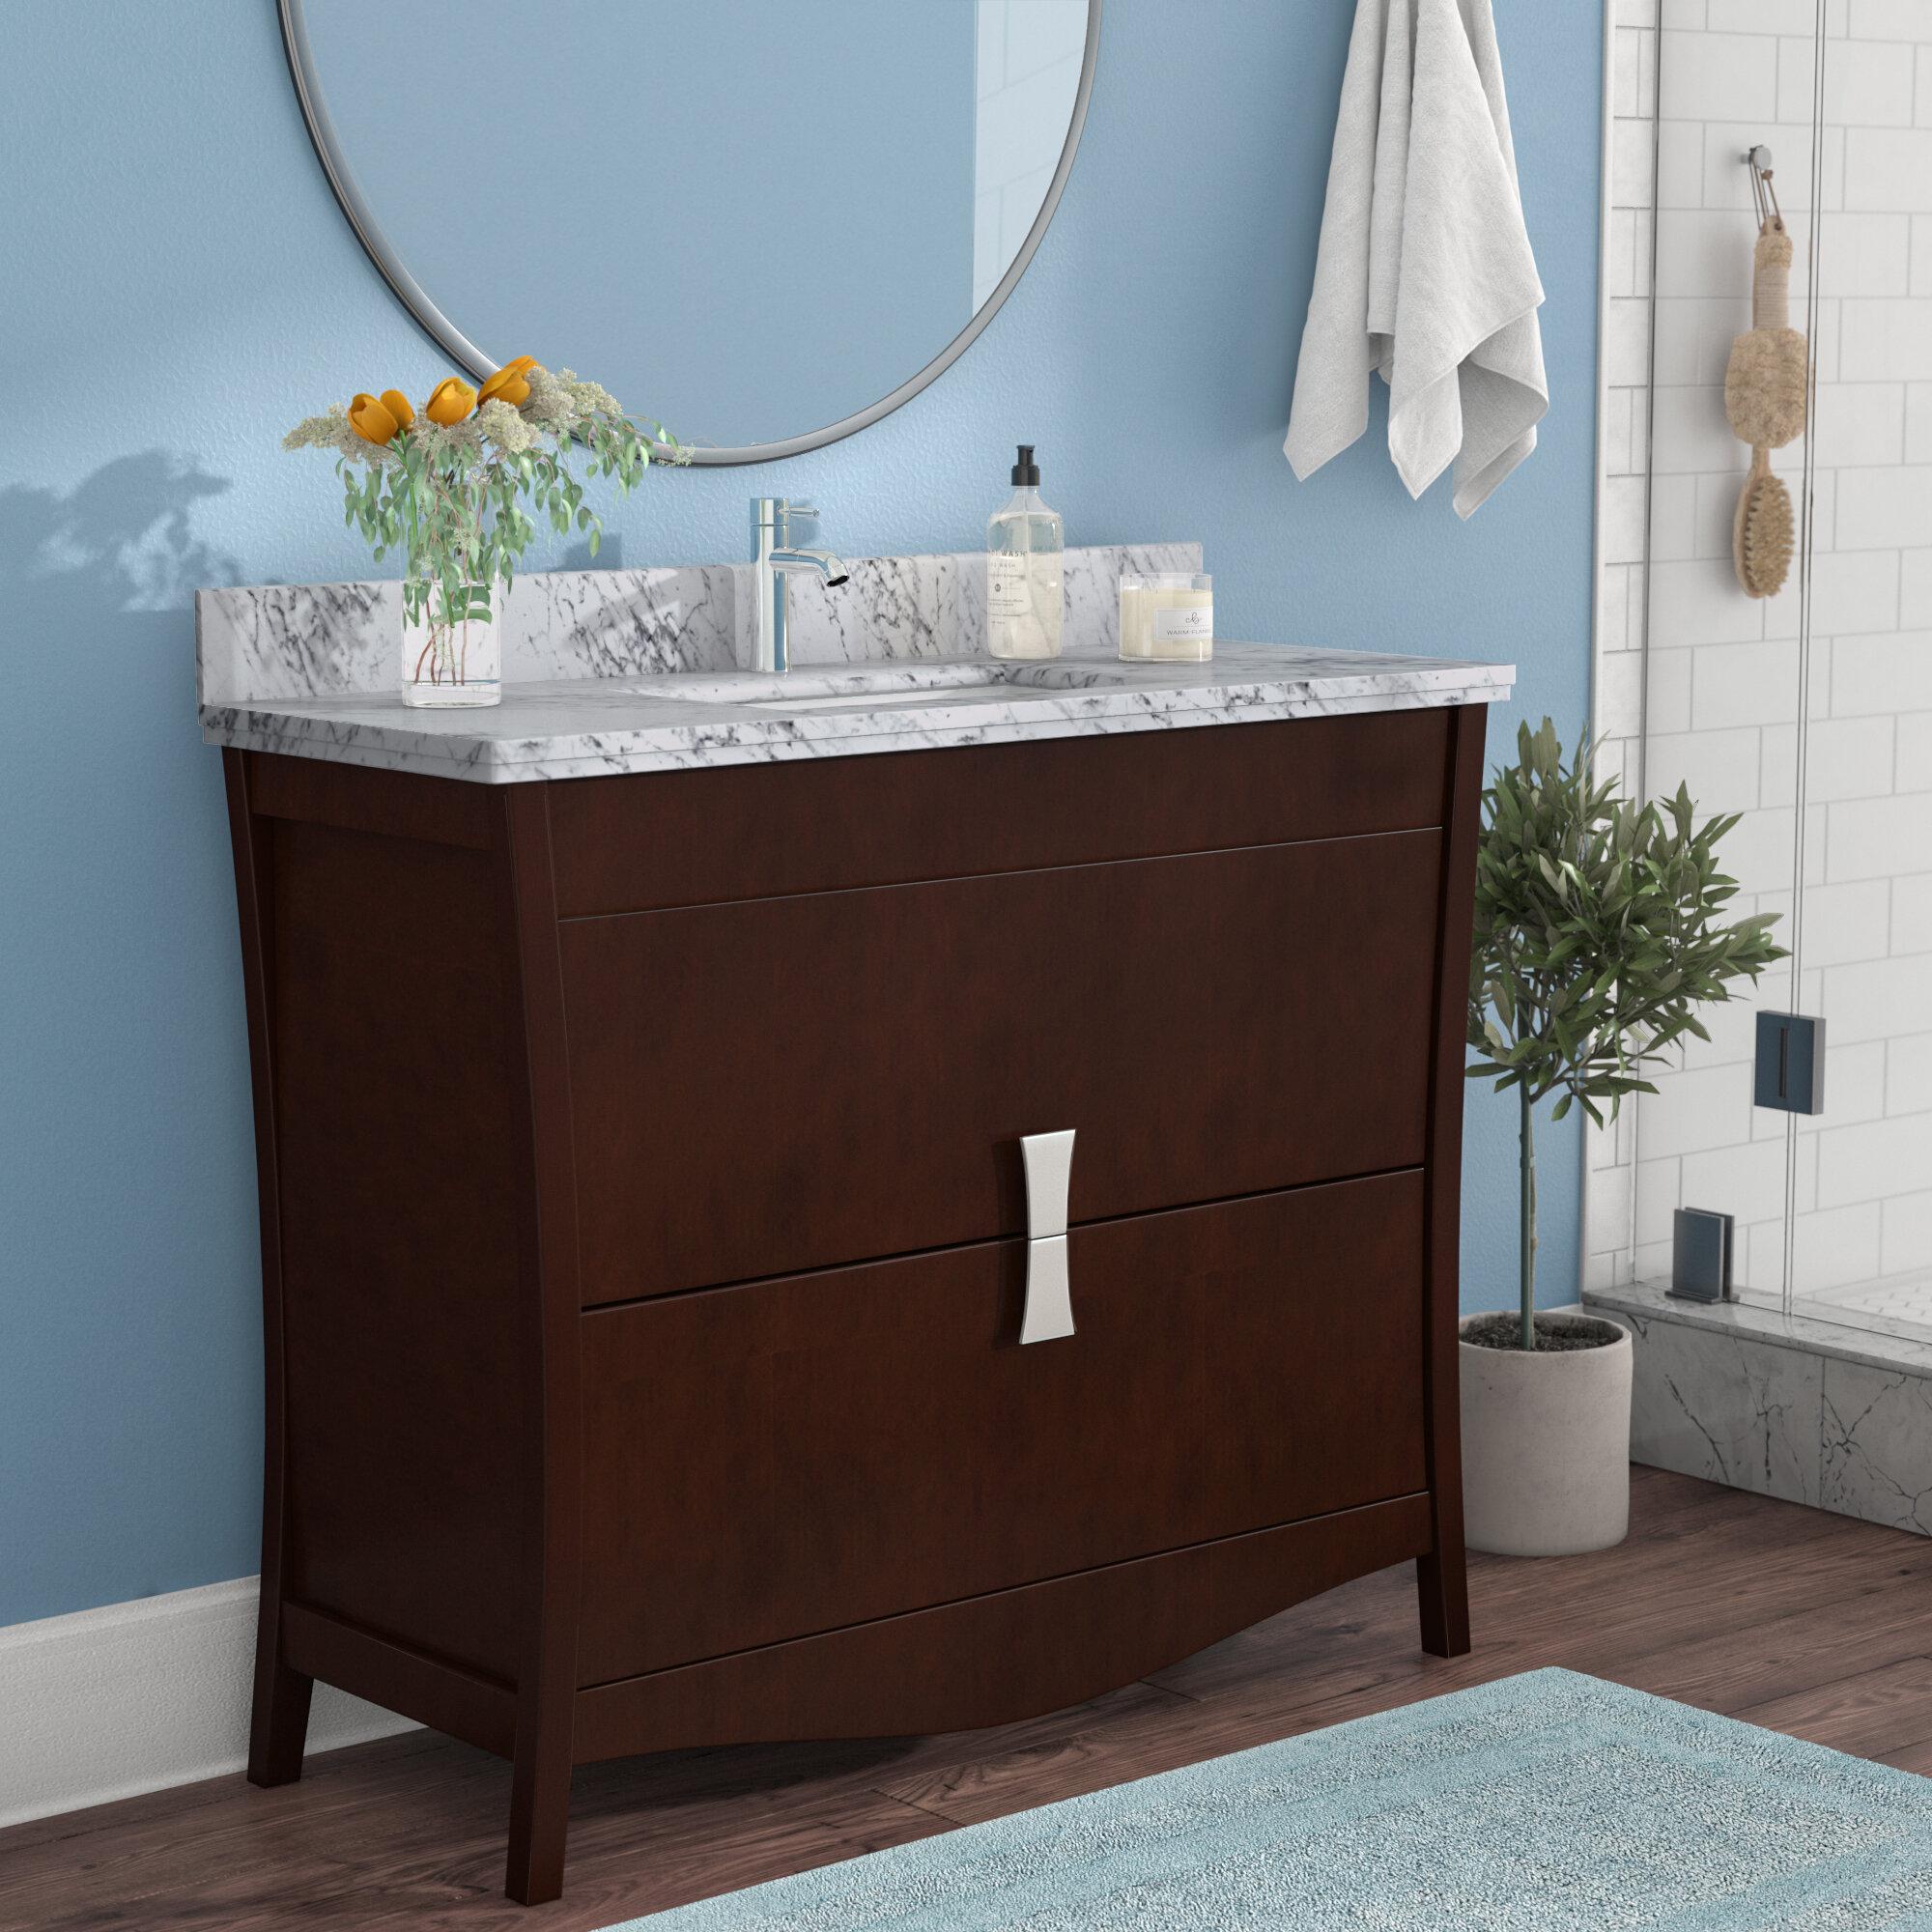 Royalpurplebathkitchen Cataldo Floor Mount 48 Single Bathroom Vanity Set With Hole Faucet Wayfair